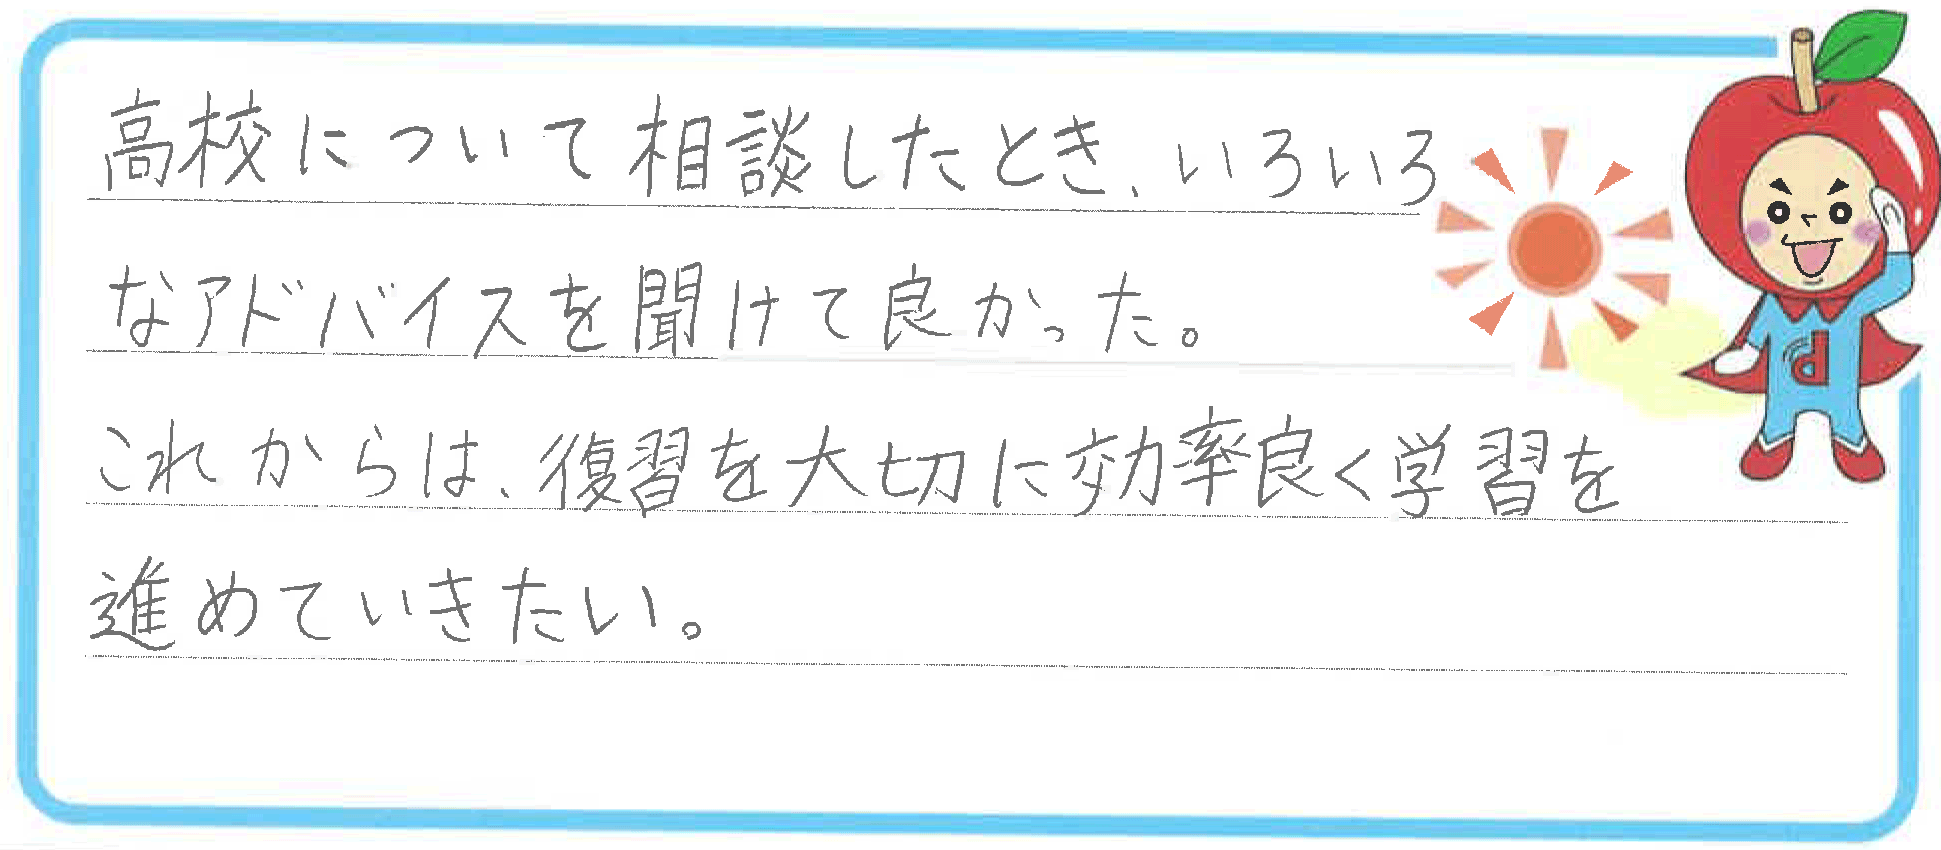 Mちゃん(可児市)からの口コミ